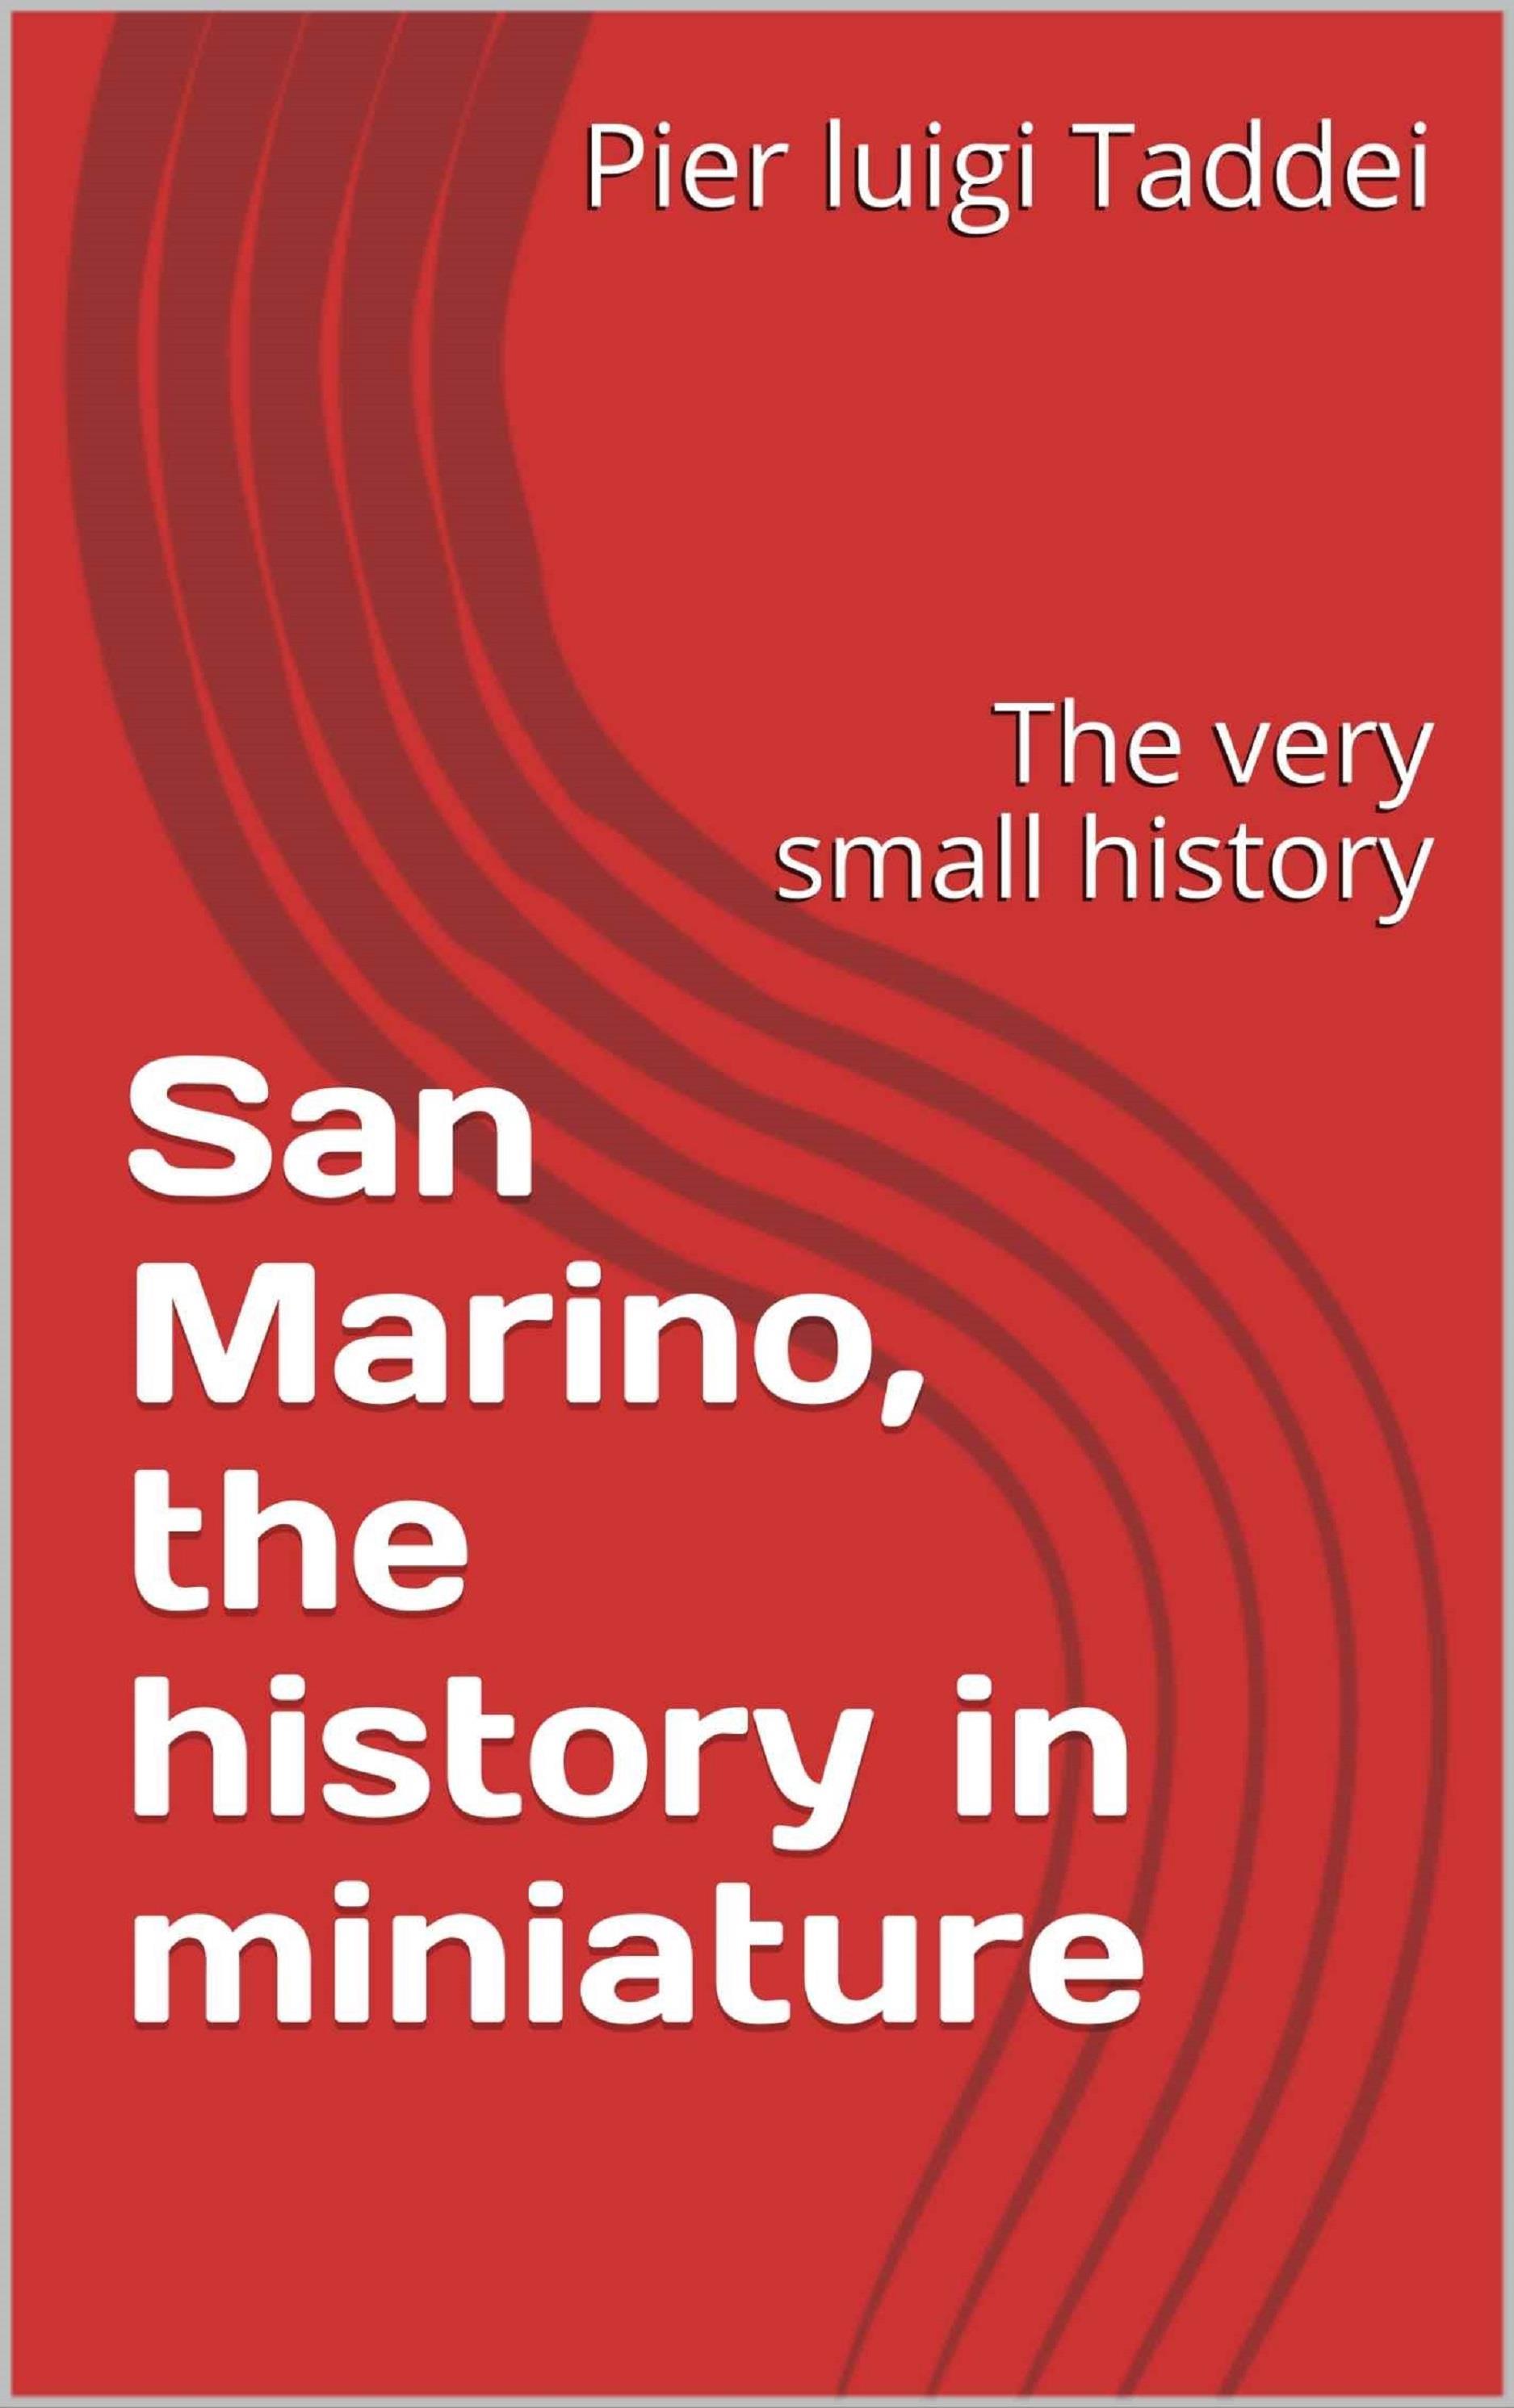 San Marino - The history in miniature